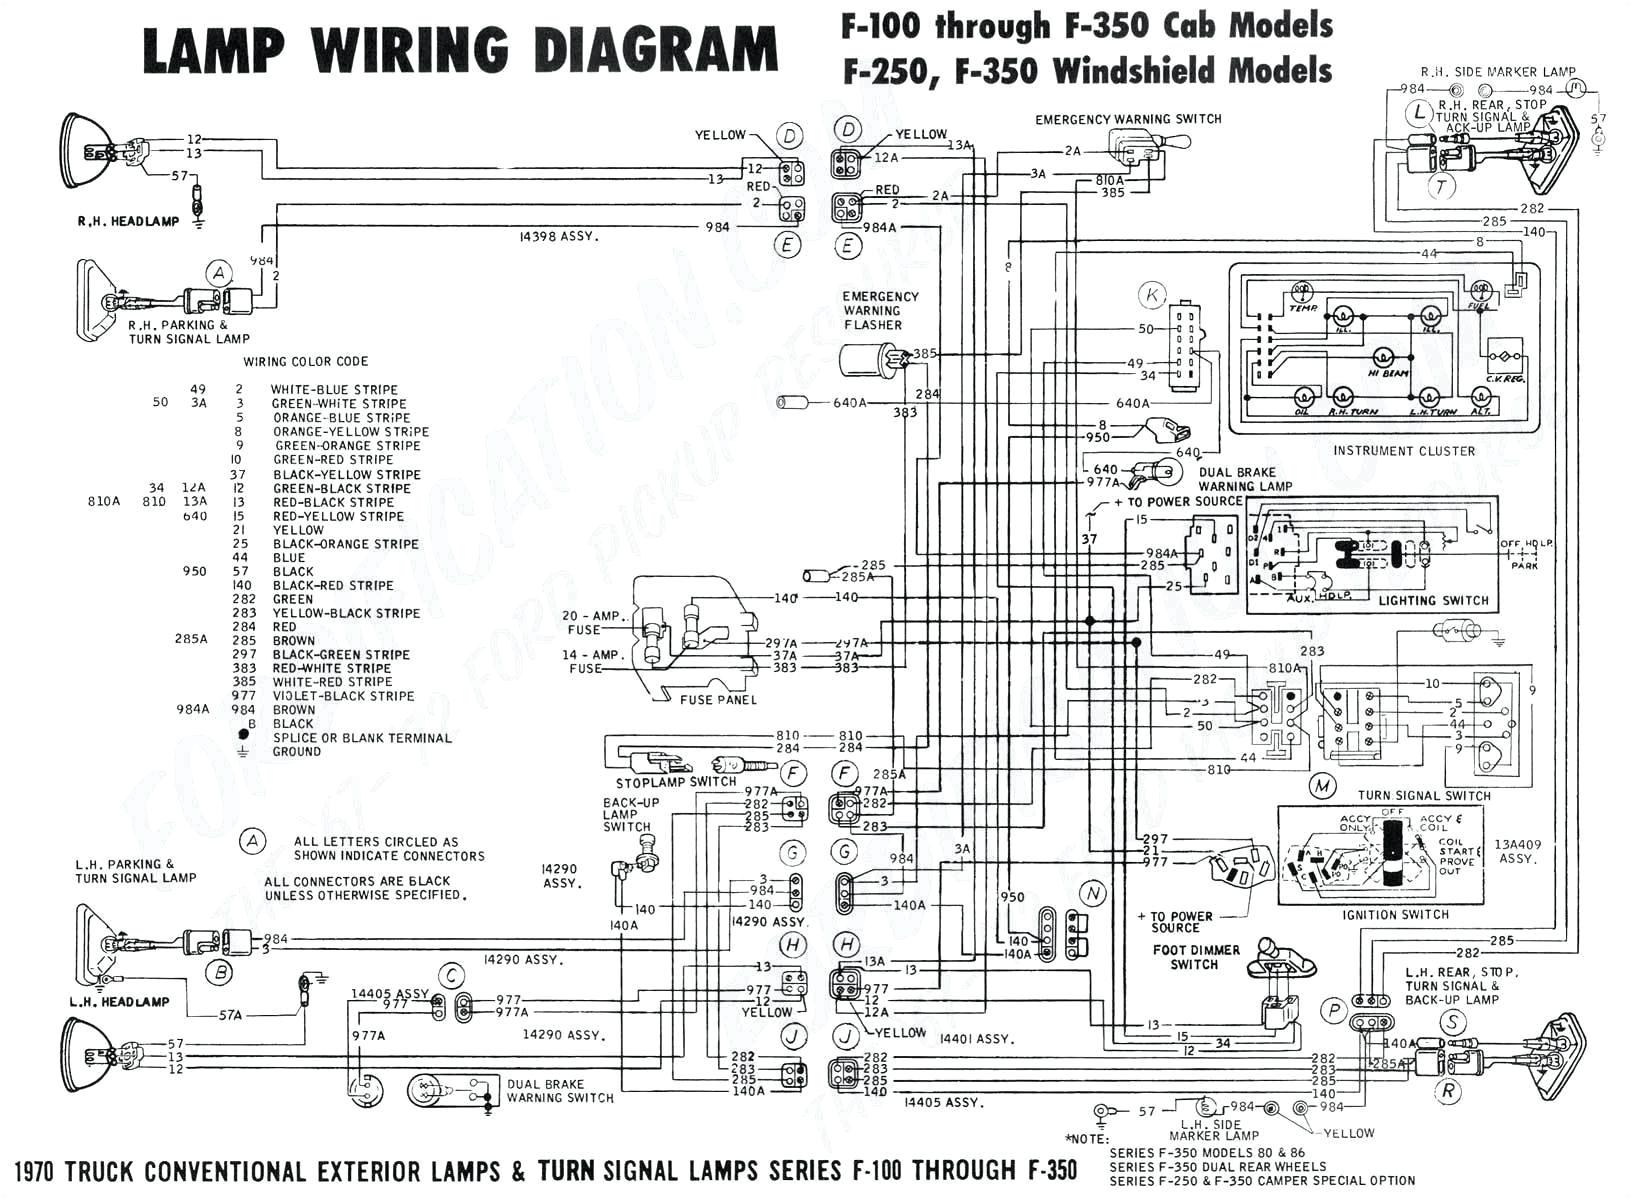 1969 suzuki as50 wiring diagram wiring diagram user 1969 suzuki as50 wiring diagram